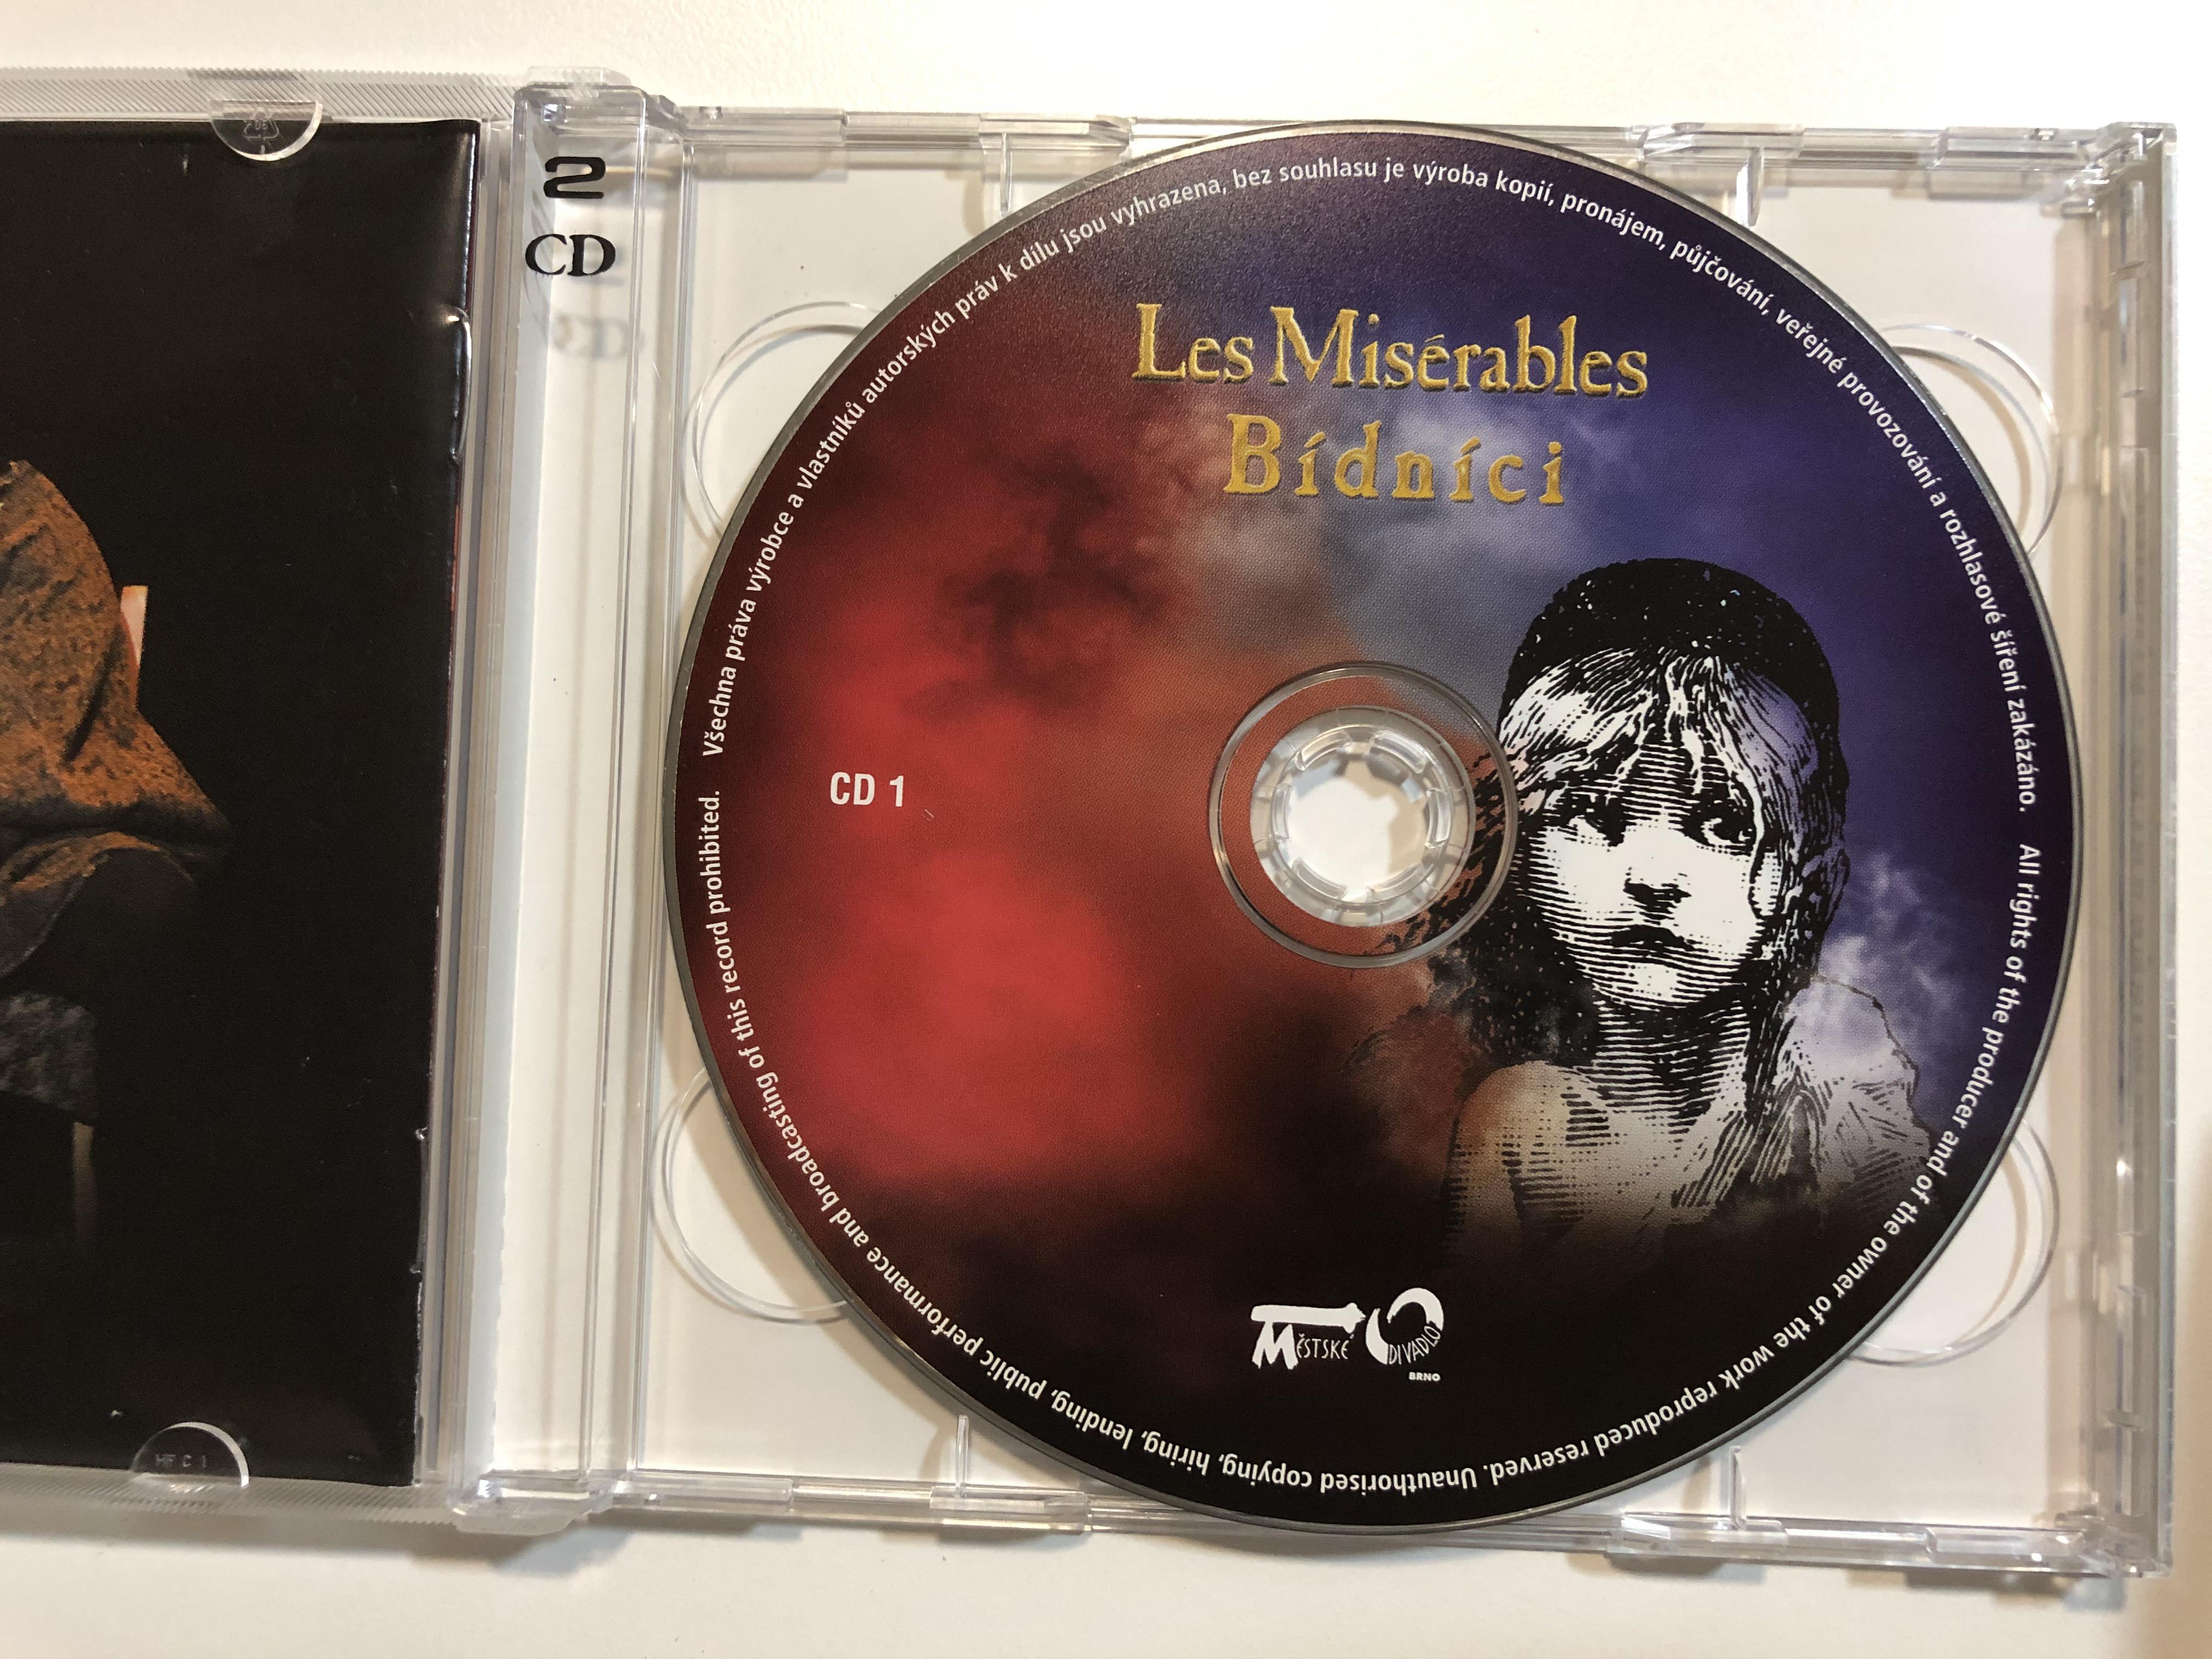 alain-boublil-a-claude-michel-schonberg-les-miserables-bidnici-original-london-production-by-cameron-mackintosh-and-royal-shakespeare-company-mestske-divadlo-brno-2x-audio-cd-9-.jpg